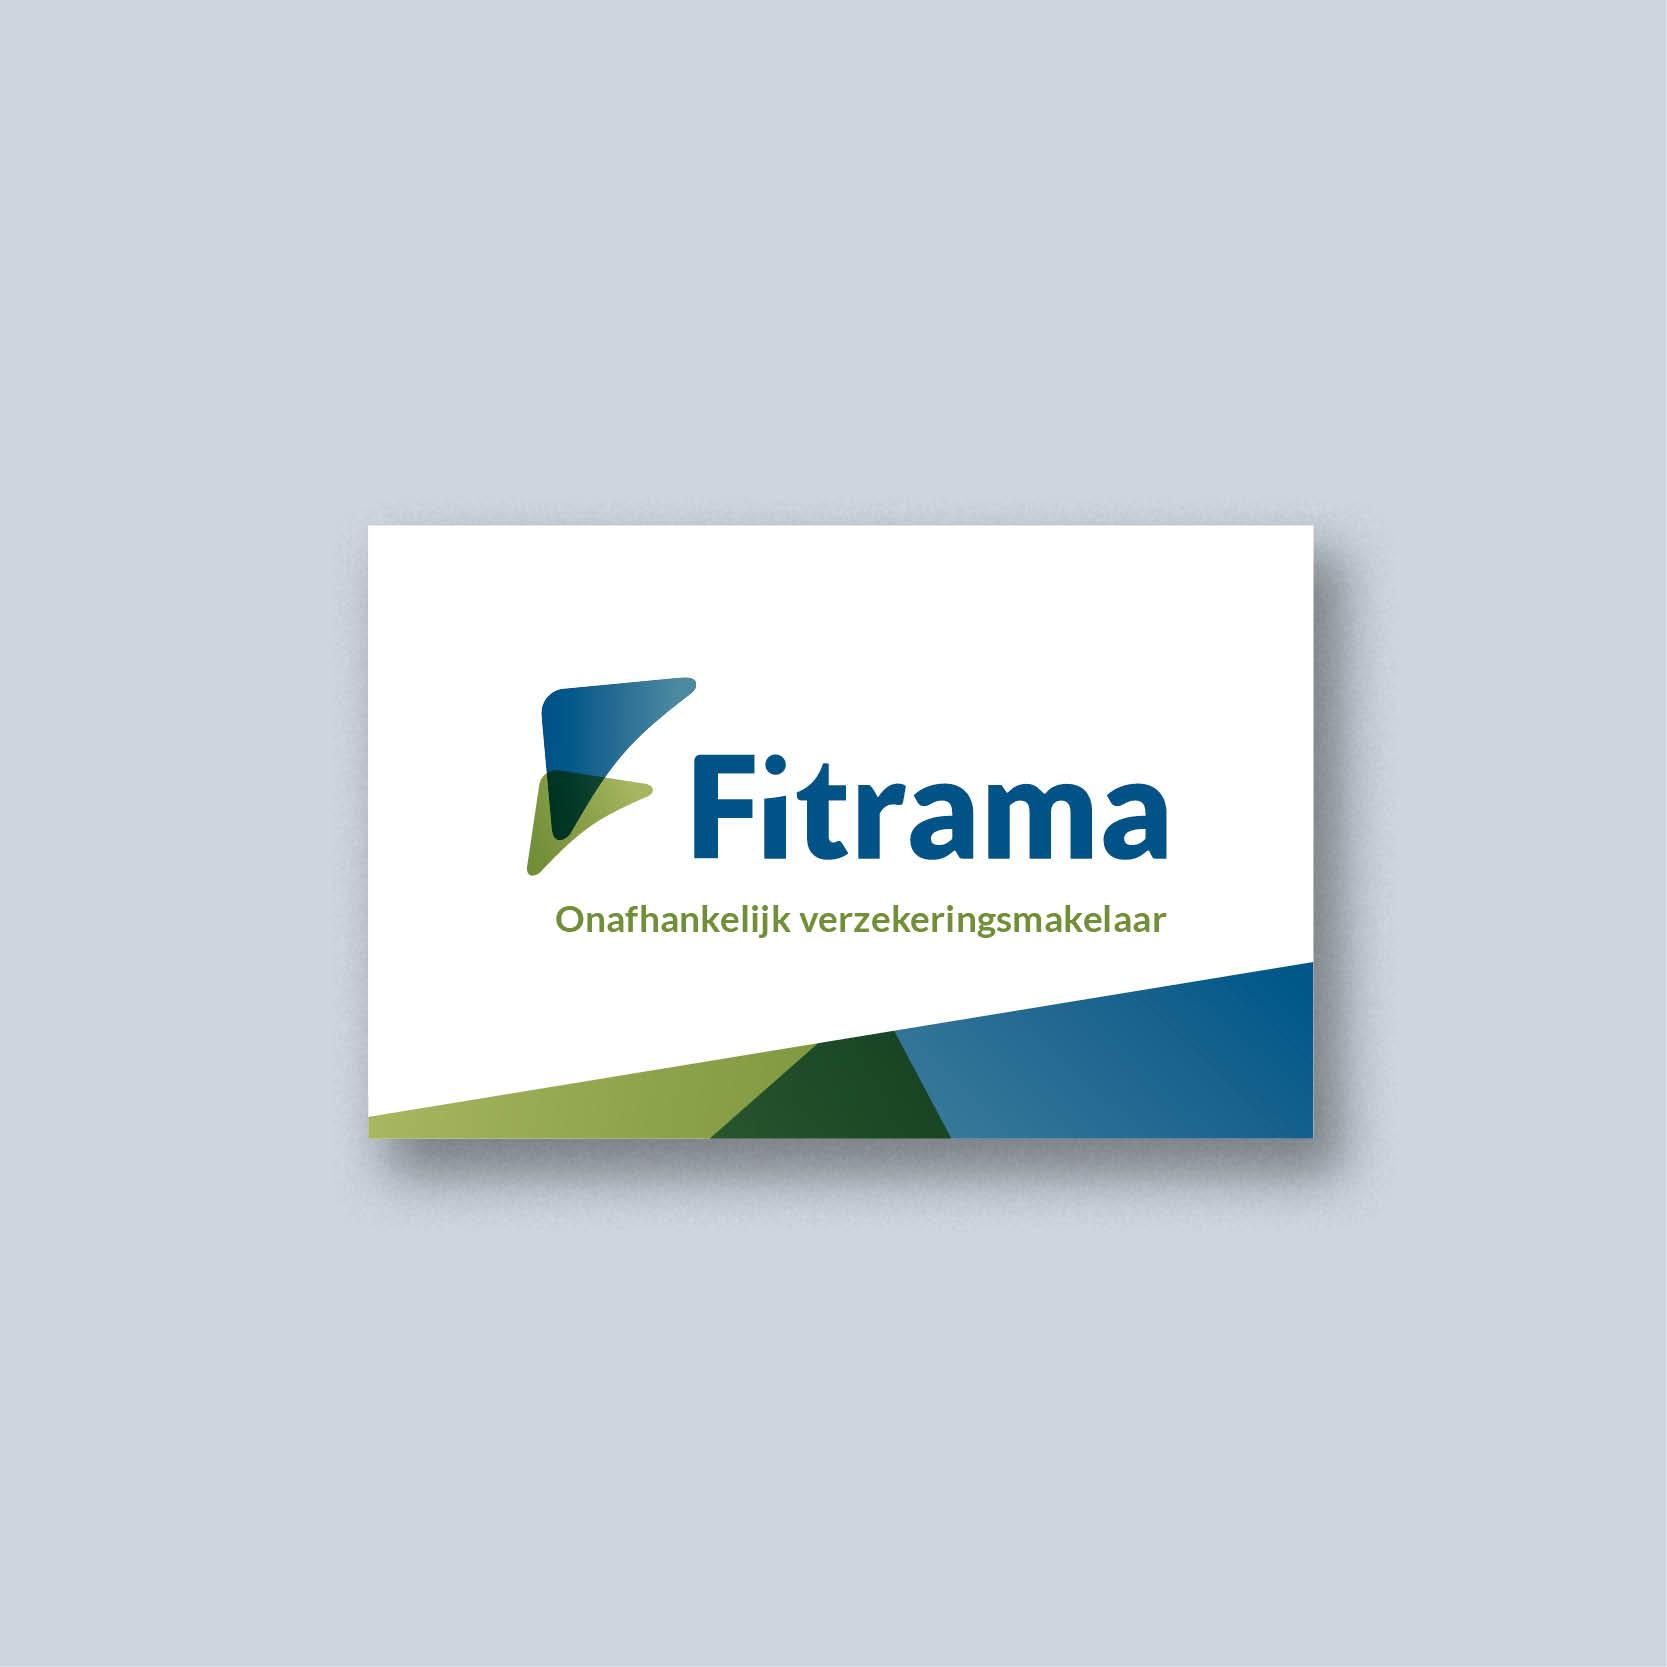 Fitrama